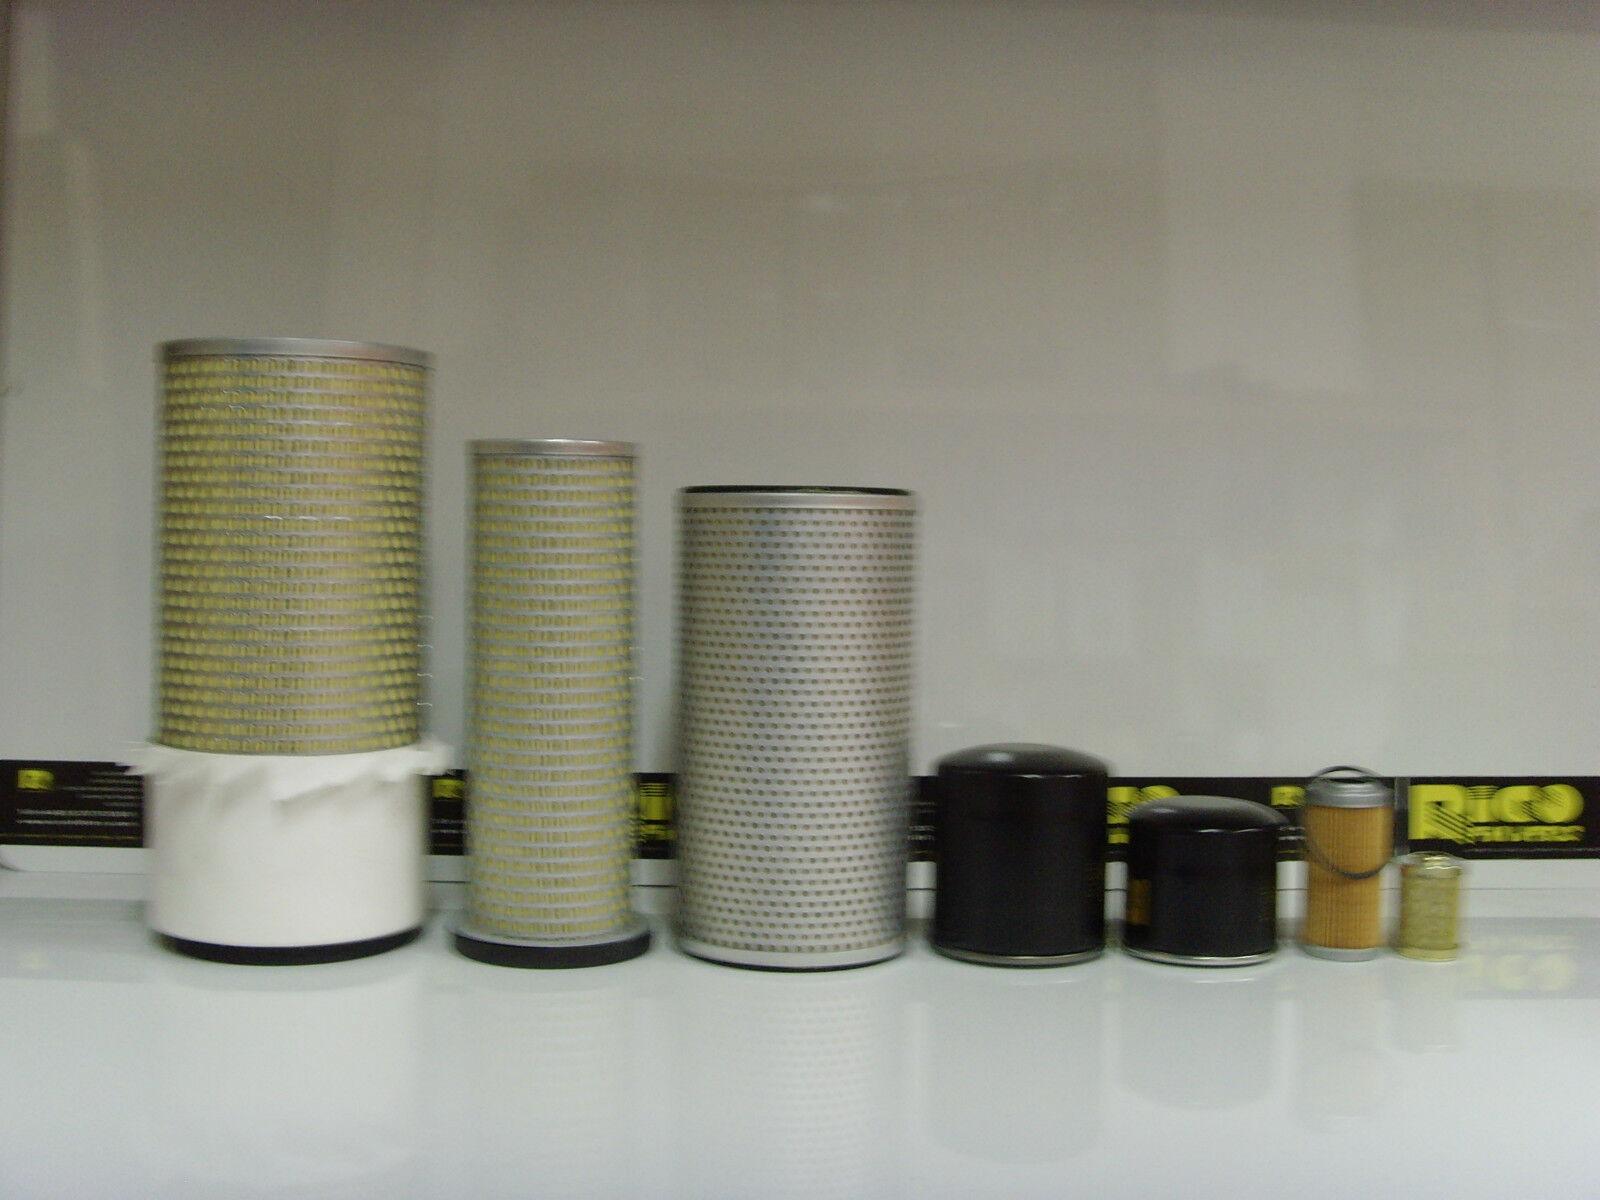 Ø16.35mm Lay Flat PVC Heat Shrink Tubing Wrap 26mm CLEAR LiPO NiMH NiCd 10m